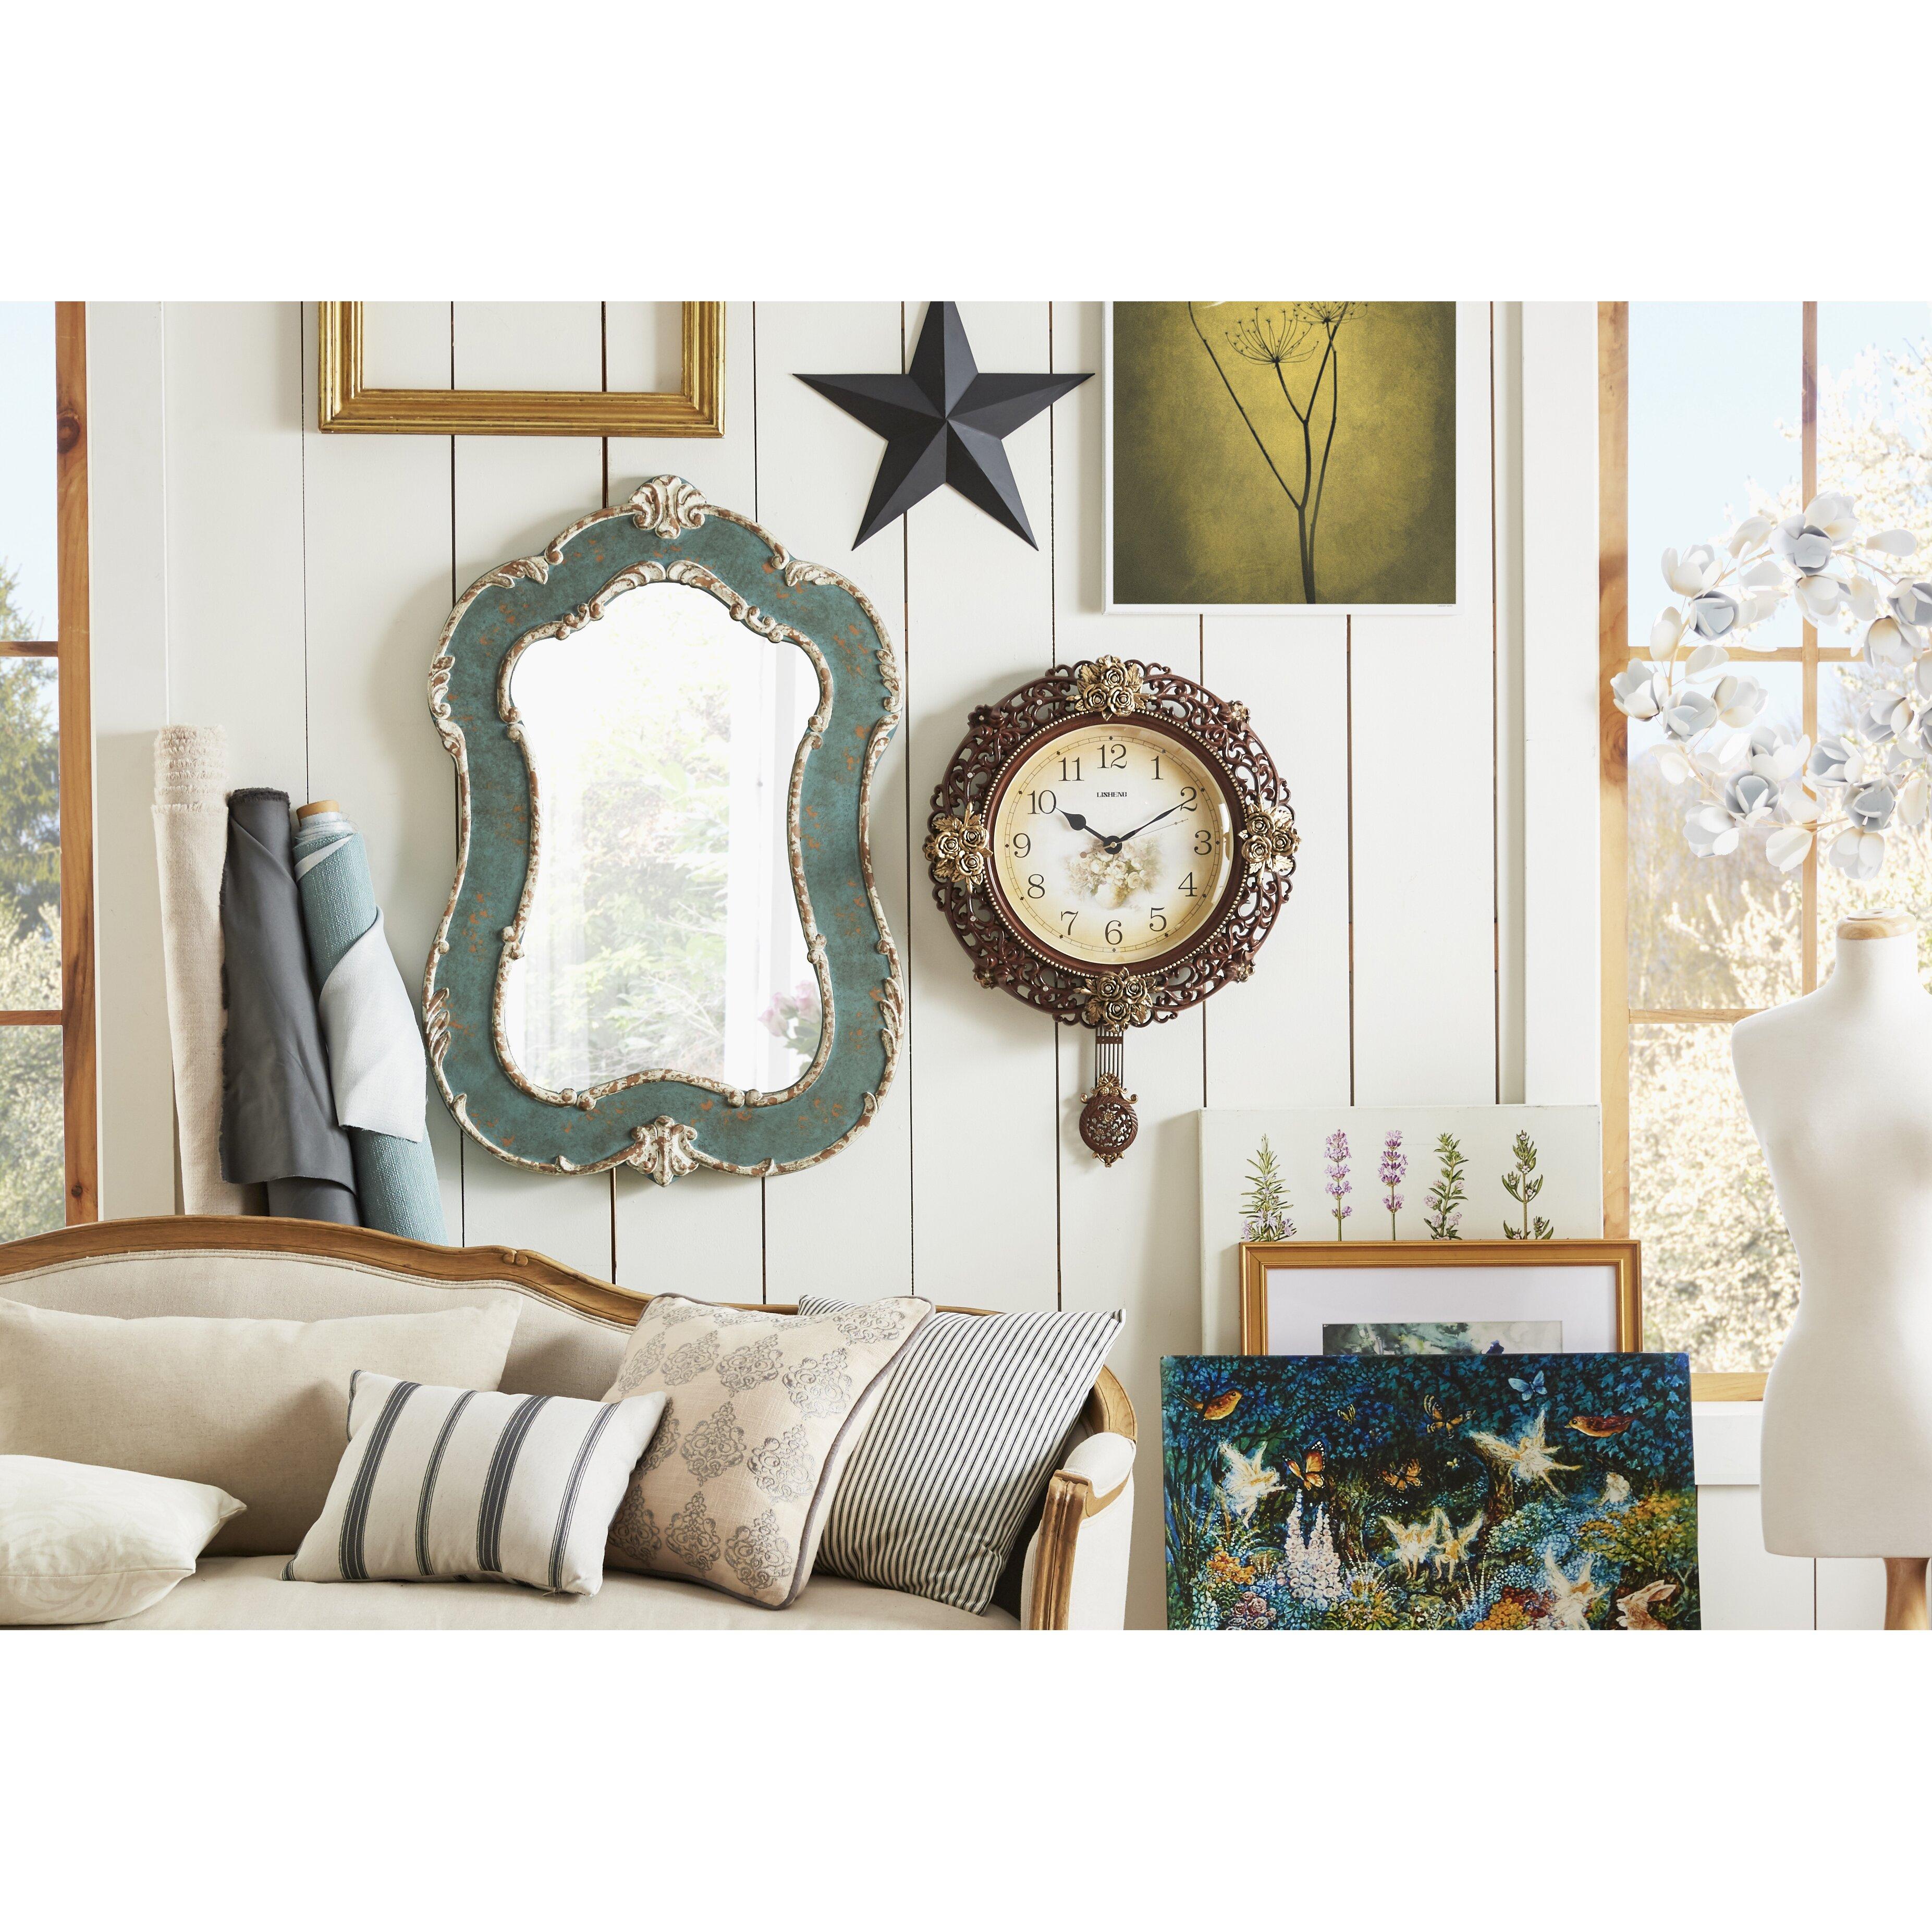 barn stars wall decor - makipera